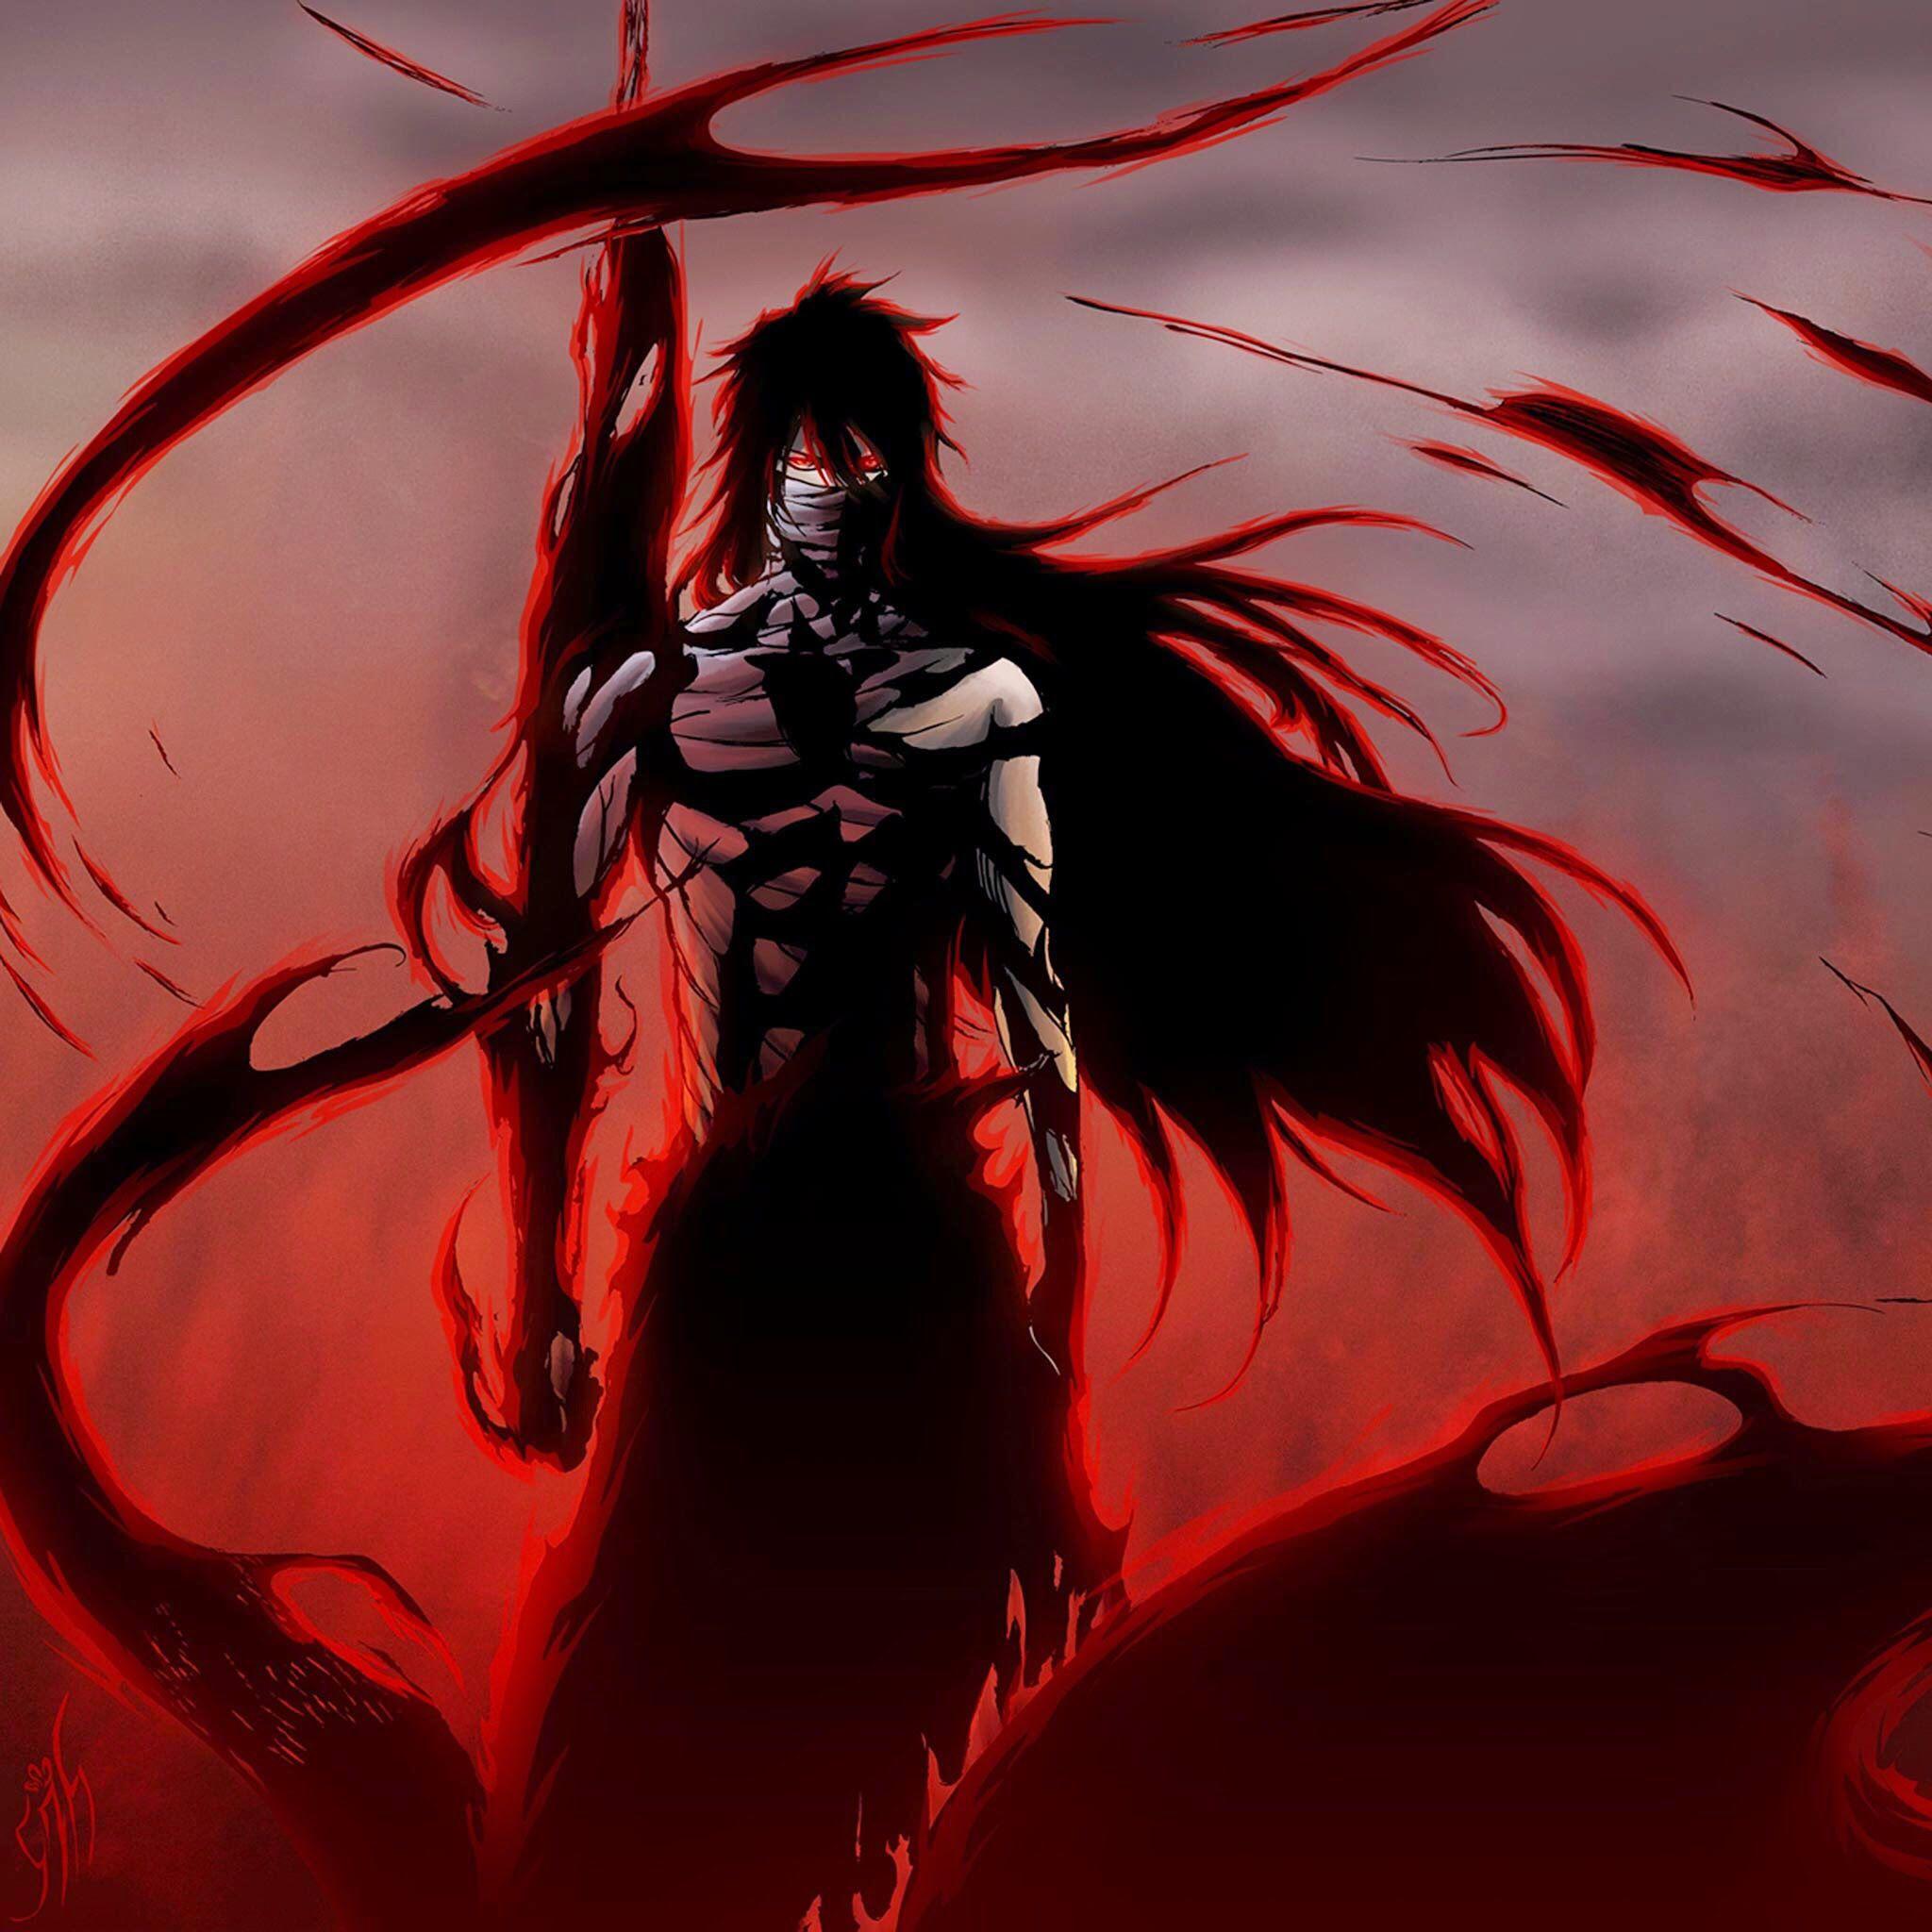 final getsuga tenshō (con imágenes) Anime hd, Anime